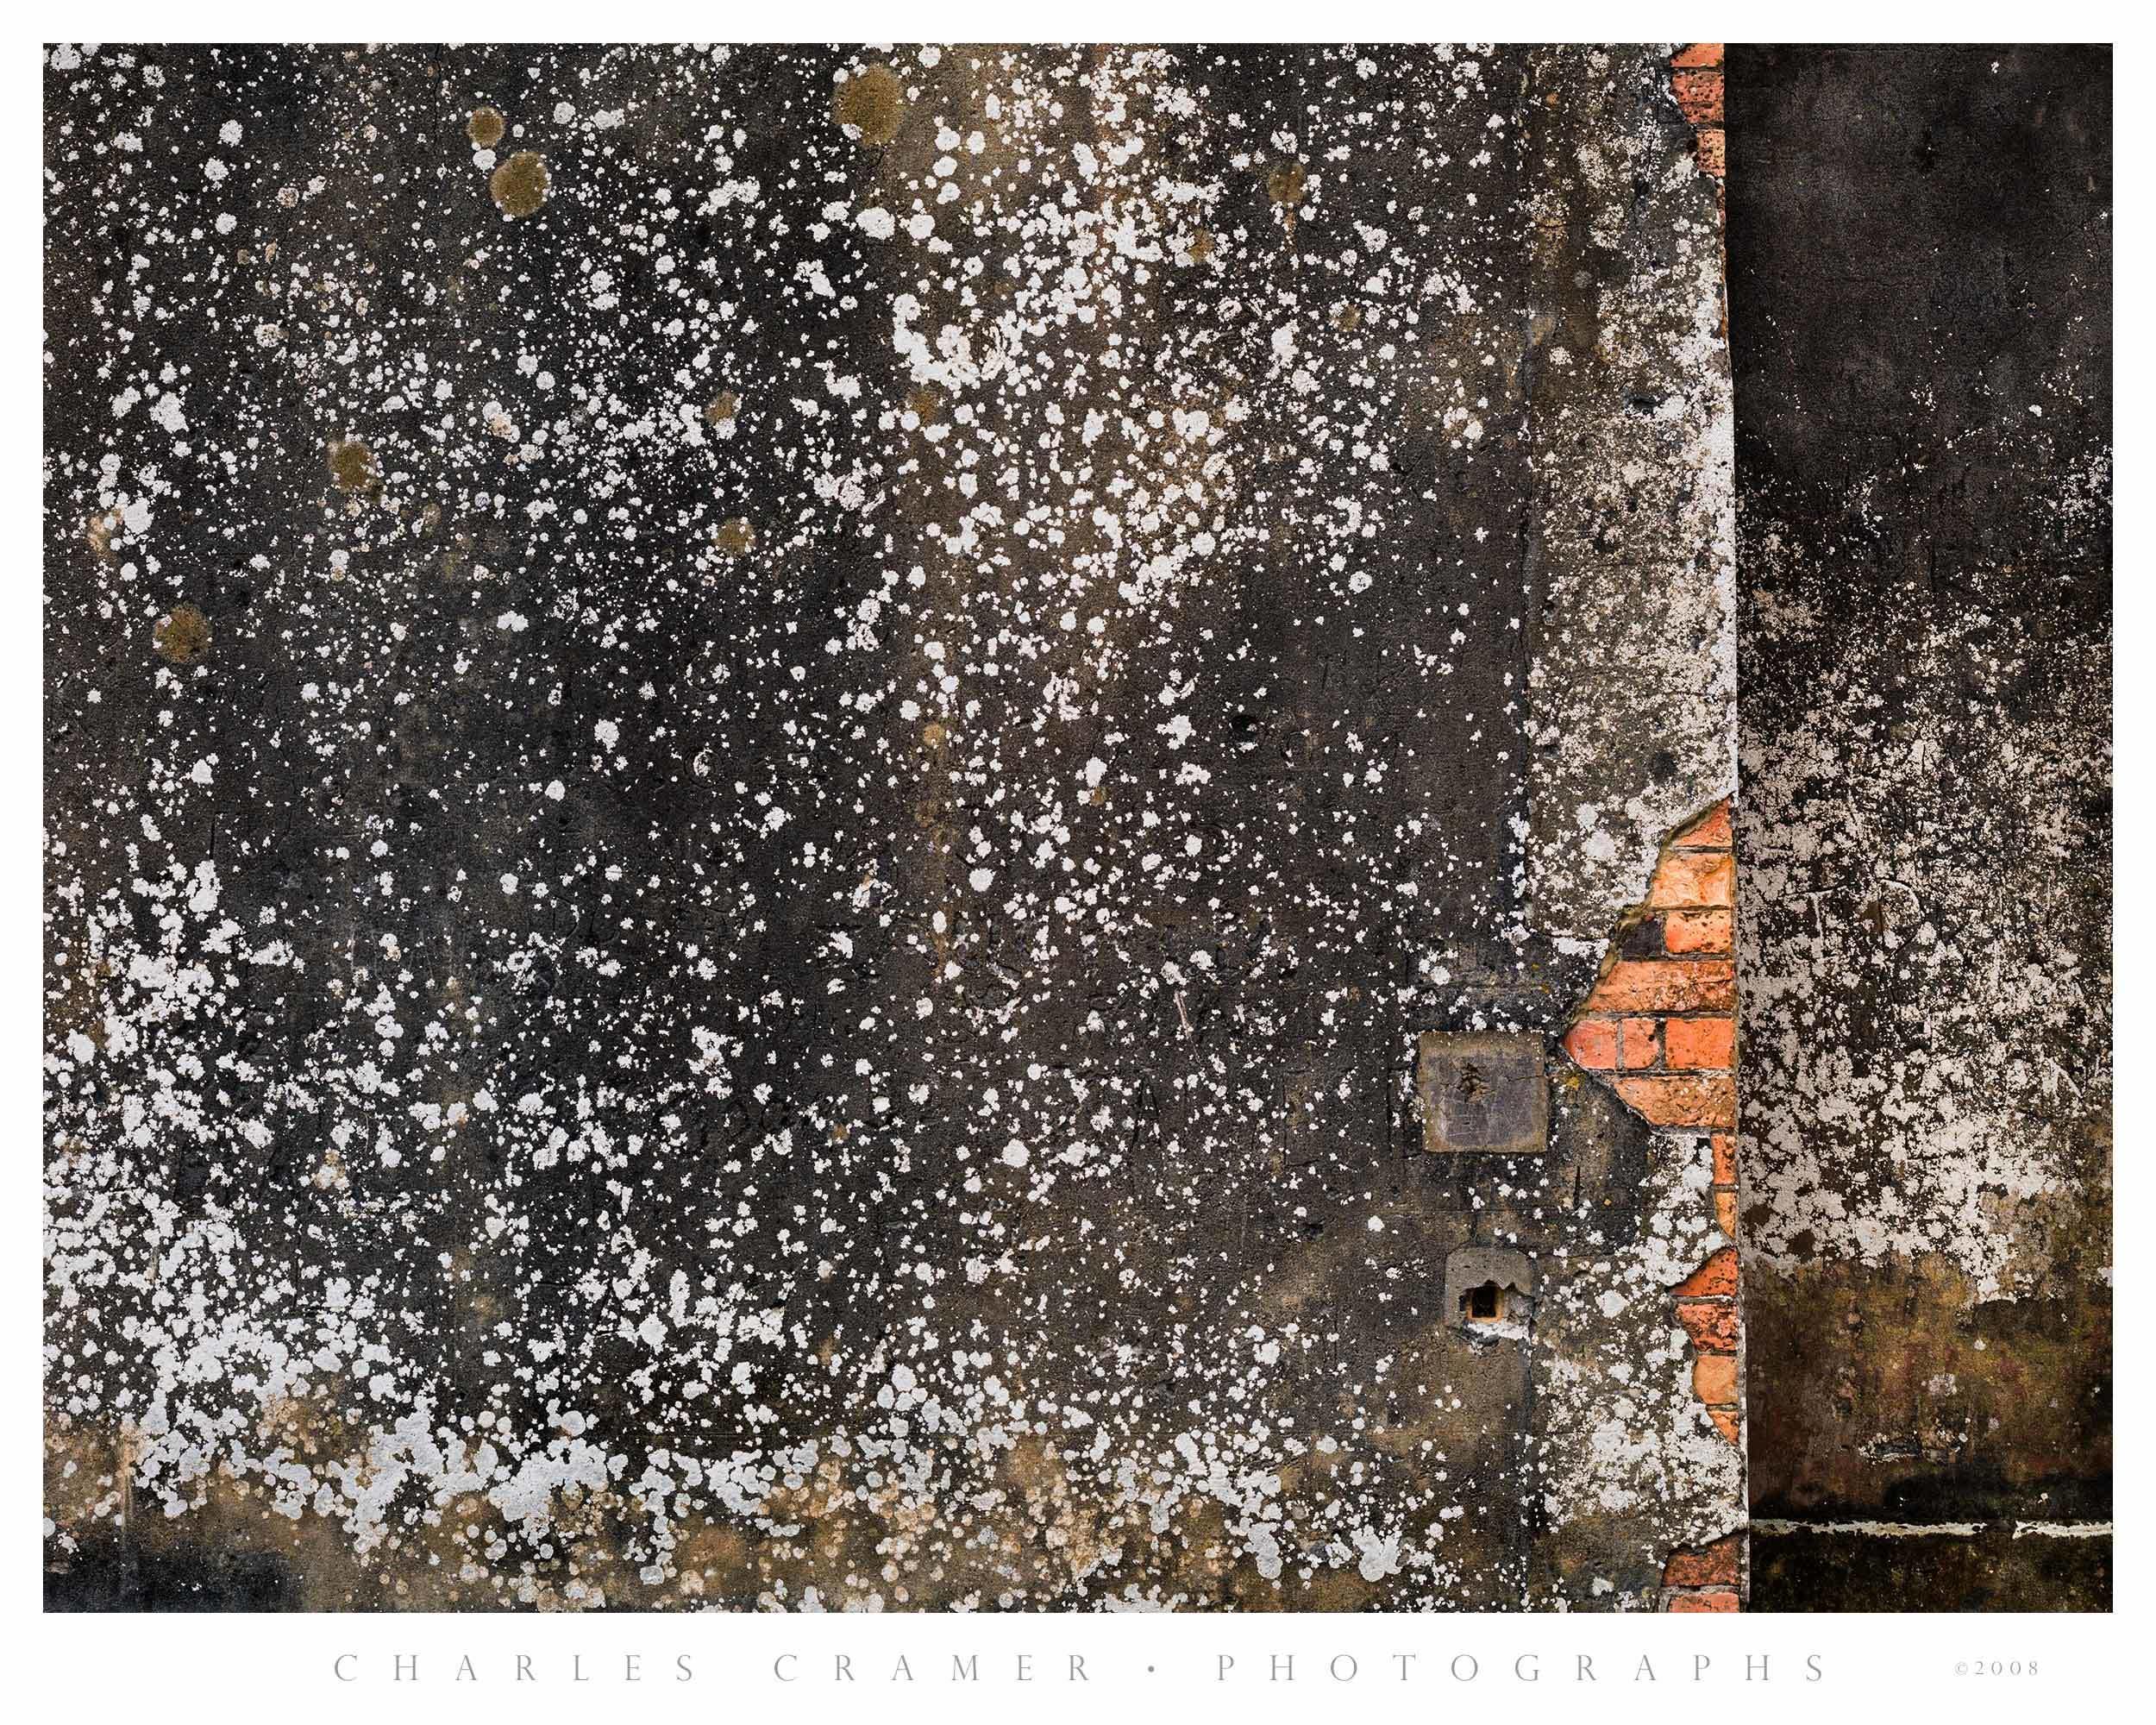 Wall Detail, Penal Colony Ruins, Tasmania, Australia